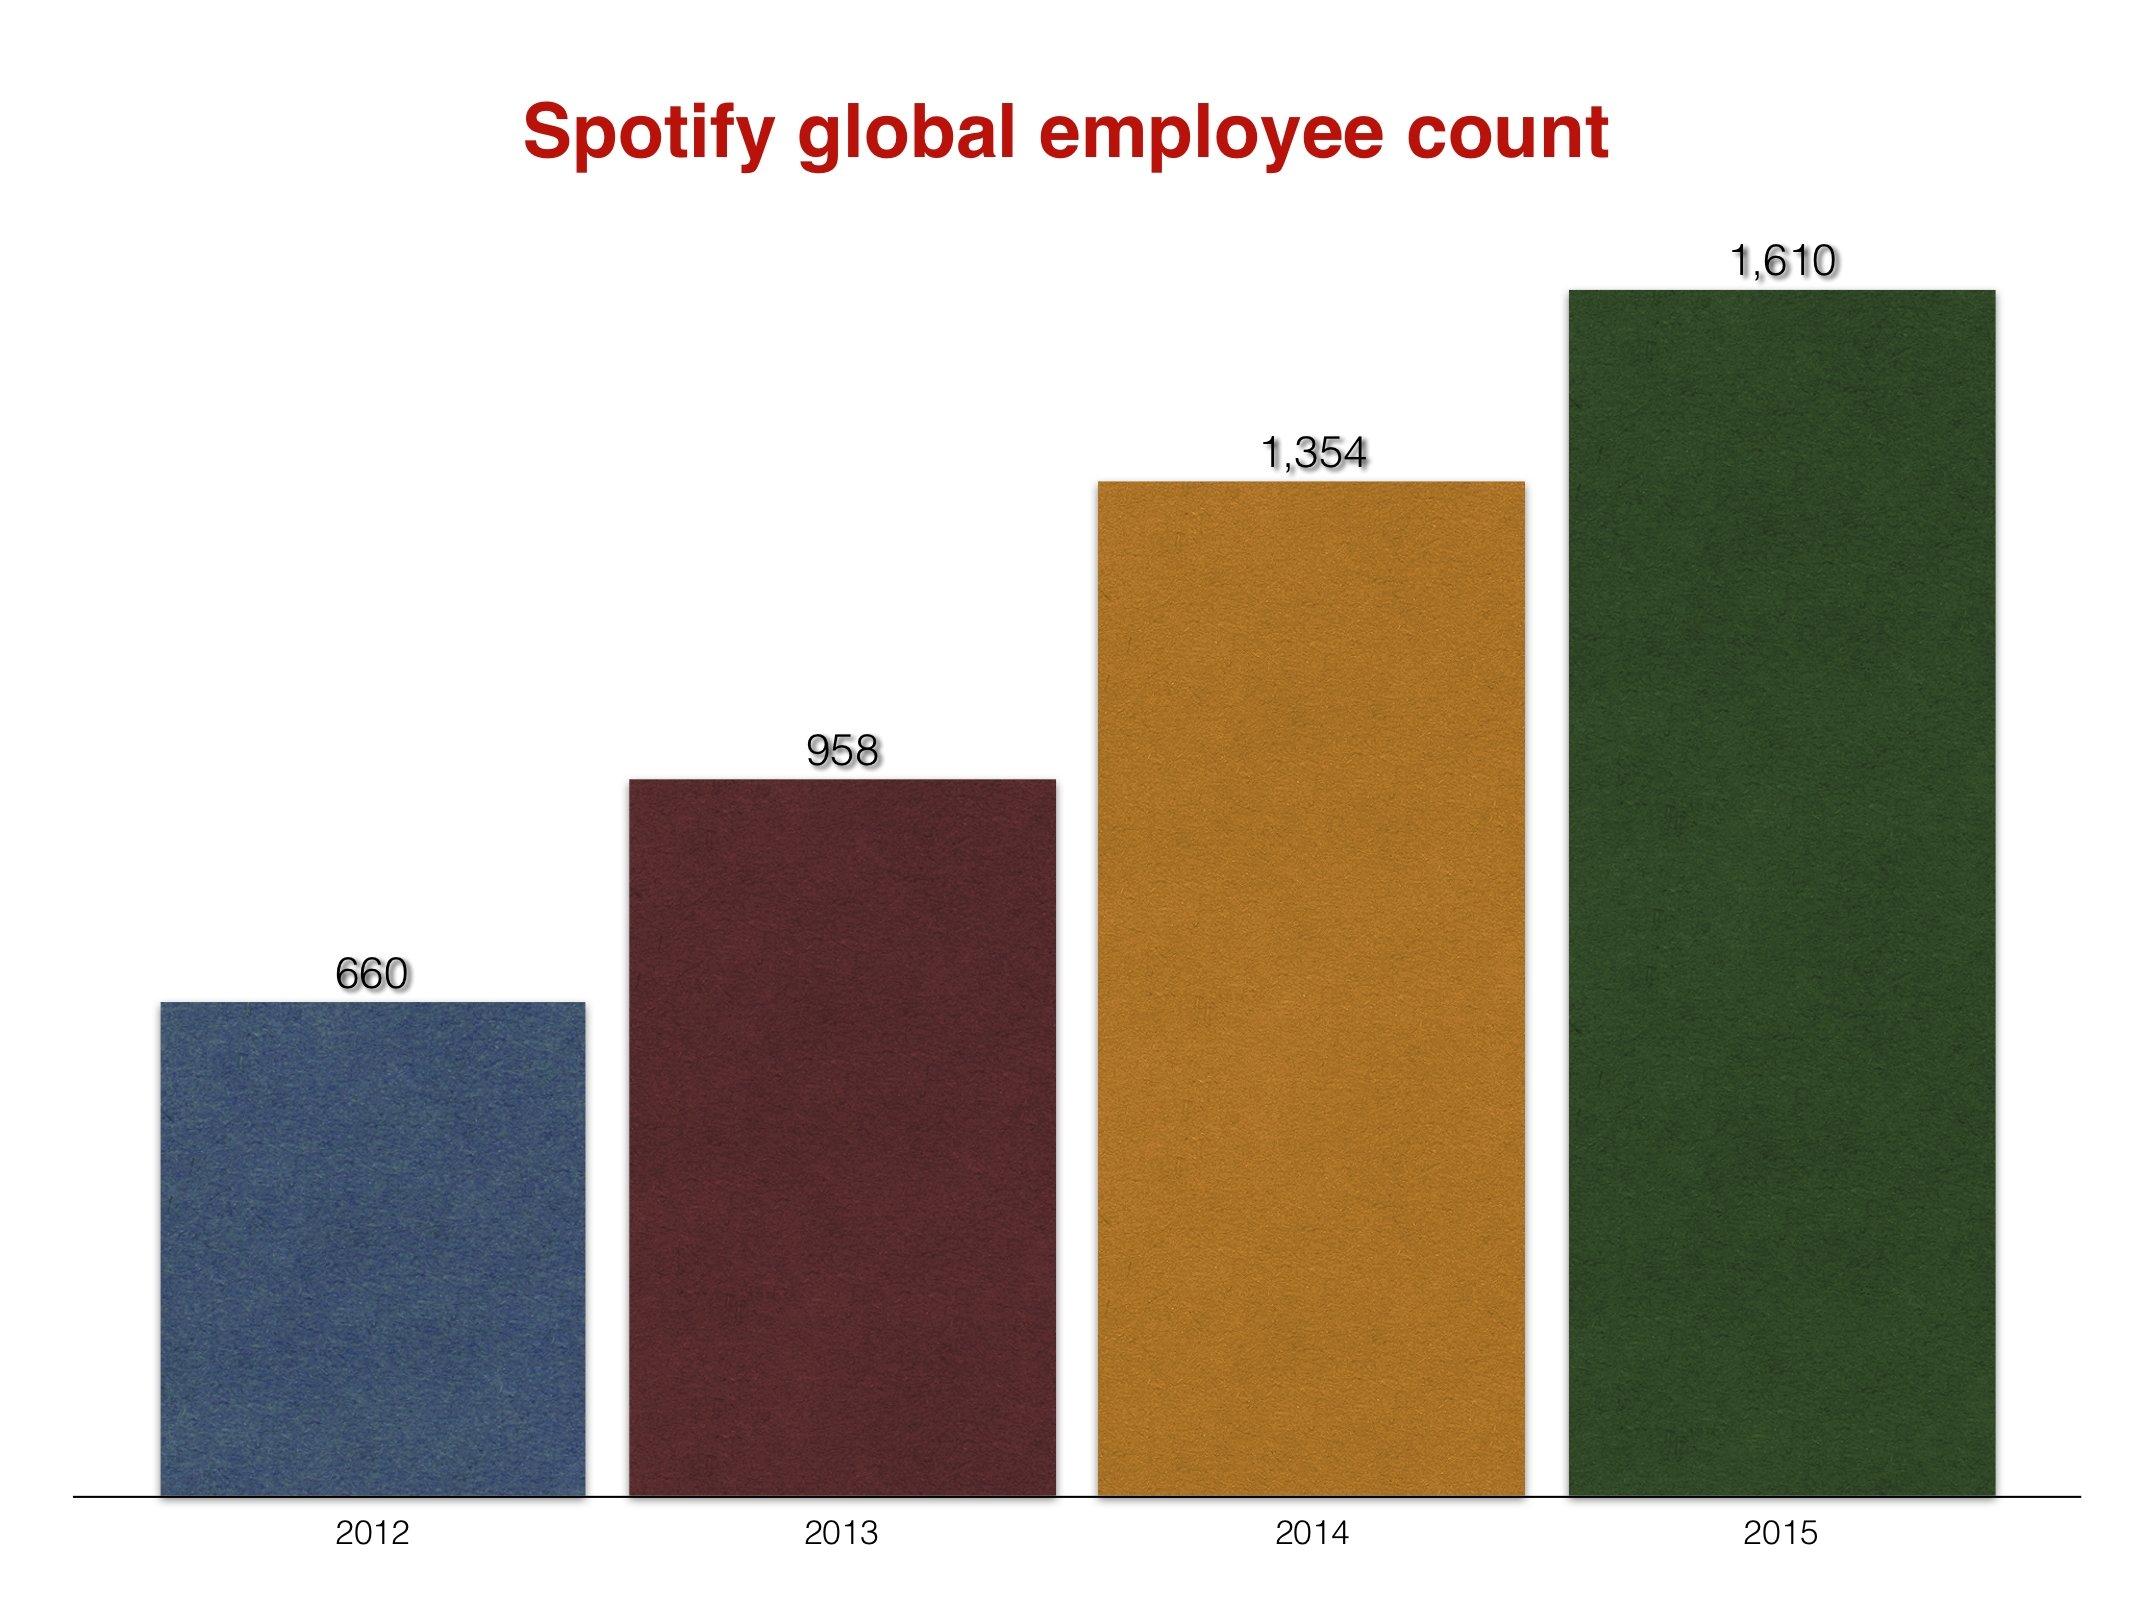 Spotifyemployees